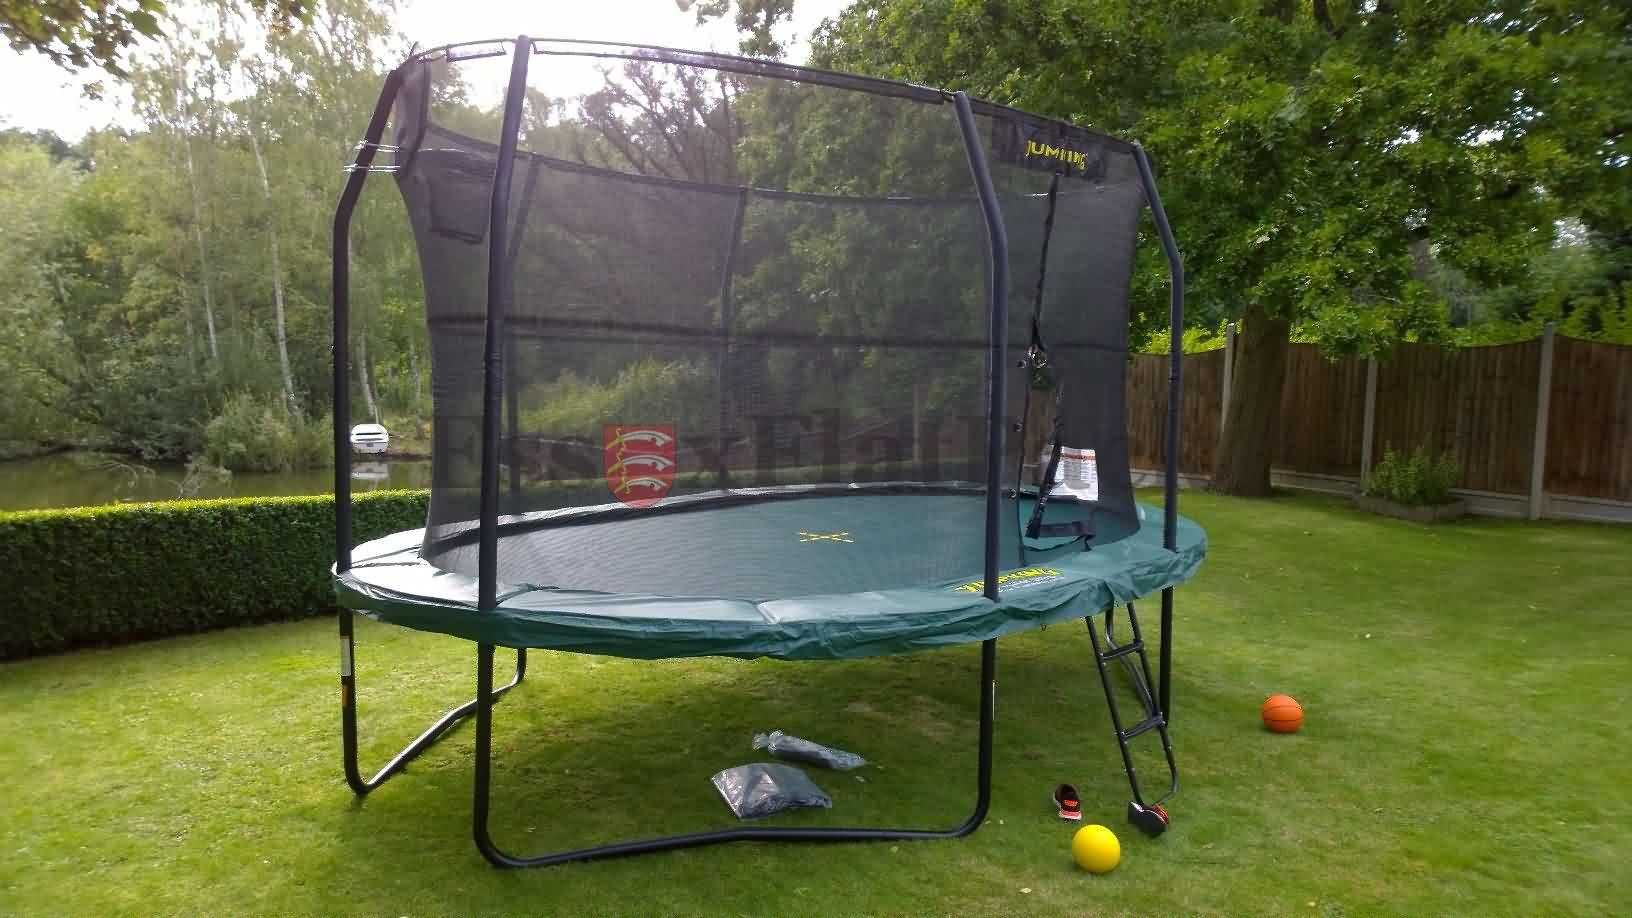 essexflatpack-trampolines-20170814164415.jpg